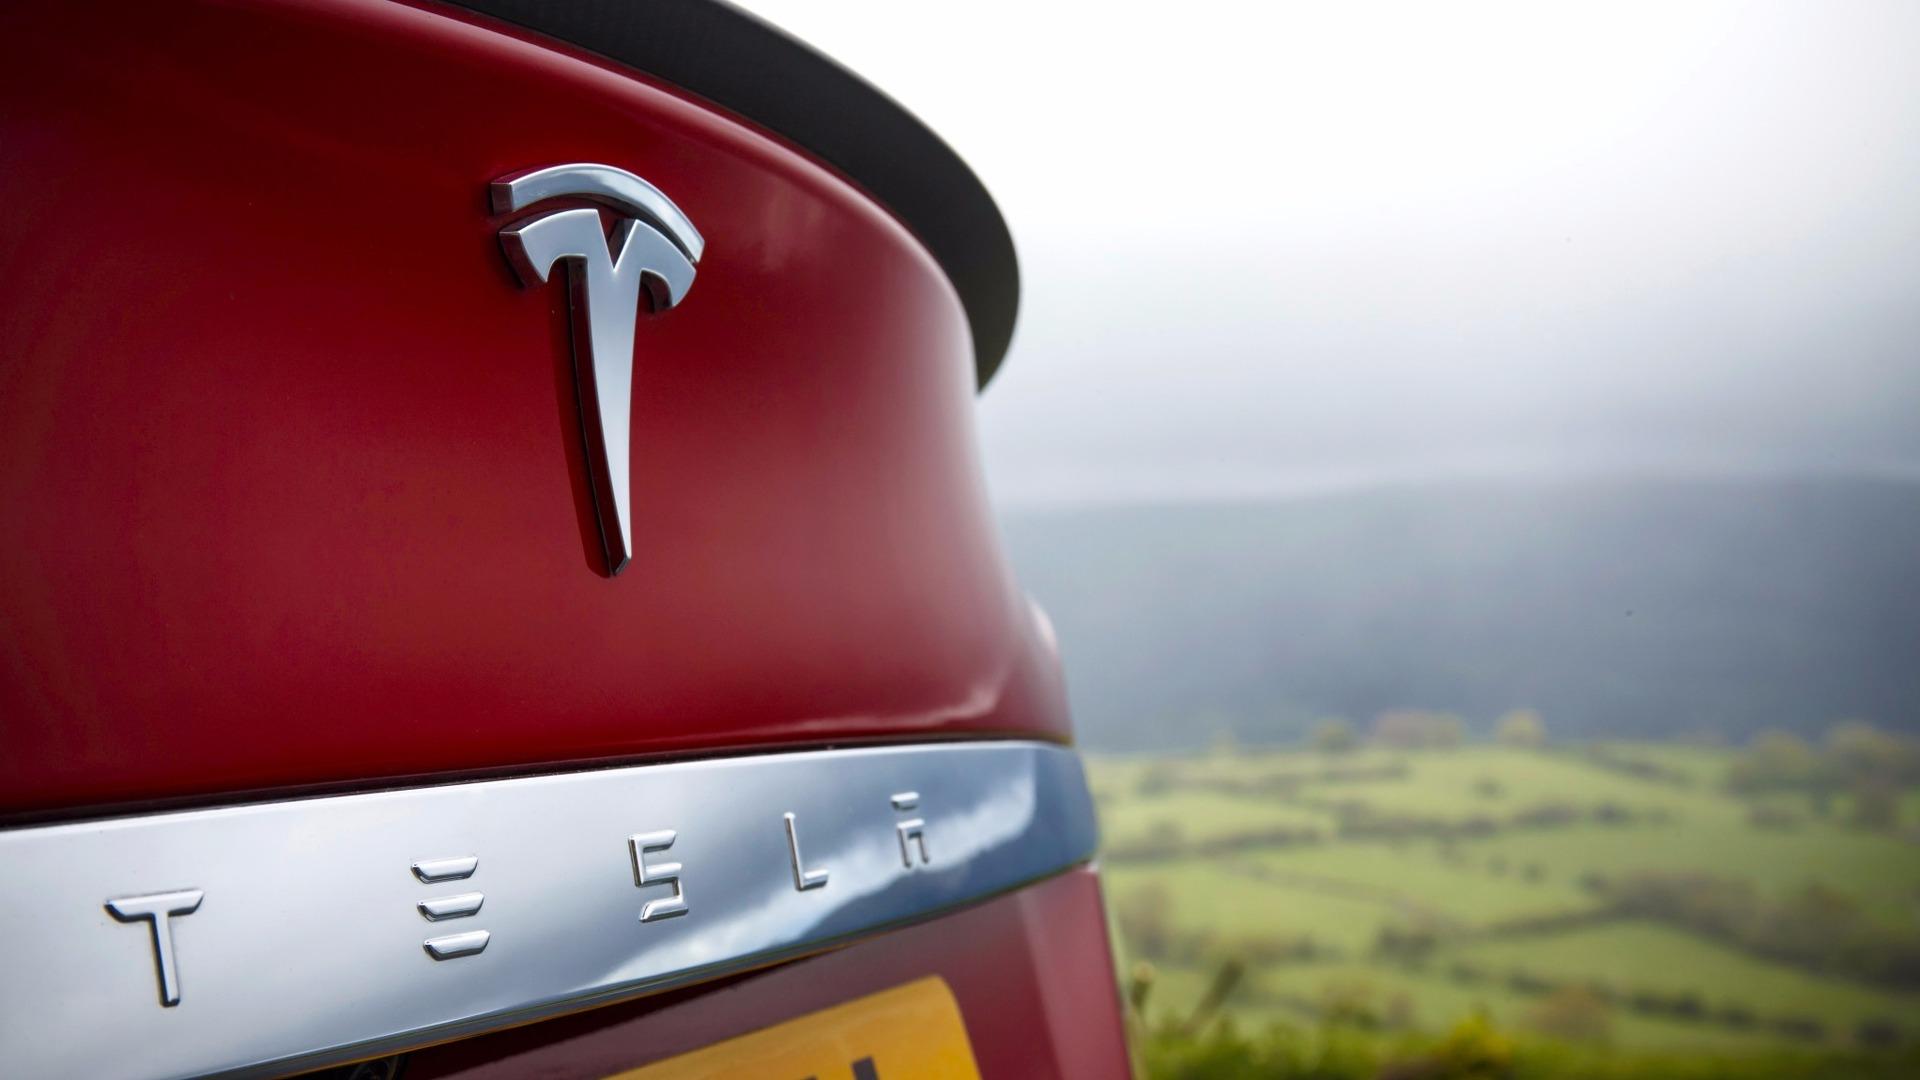 Tesla breaks into top 100 global brand rankings